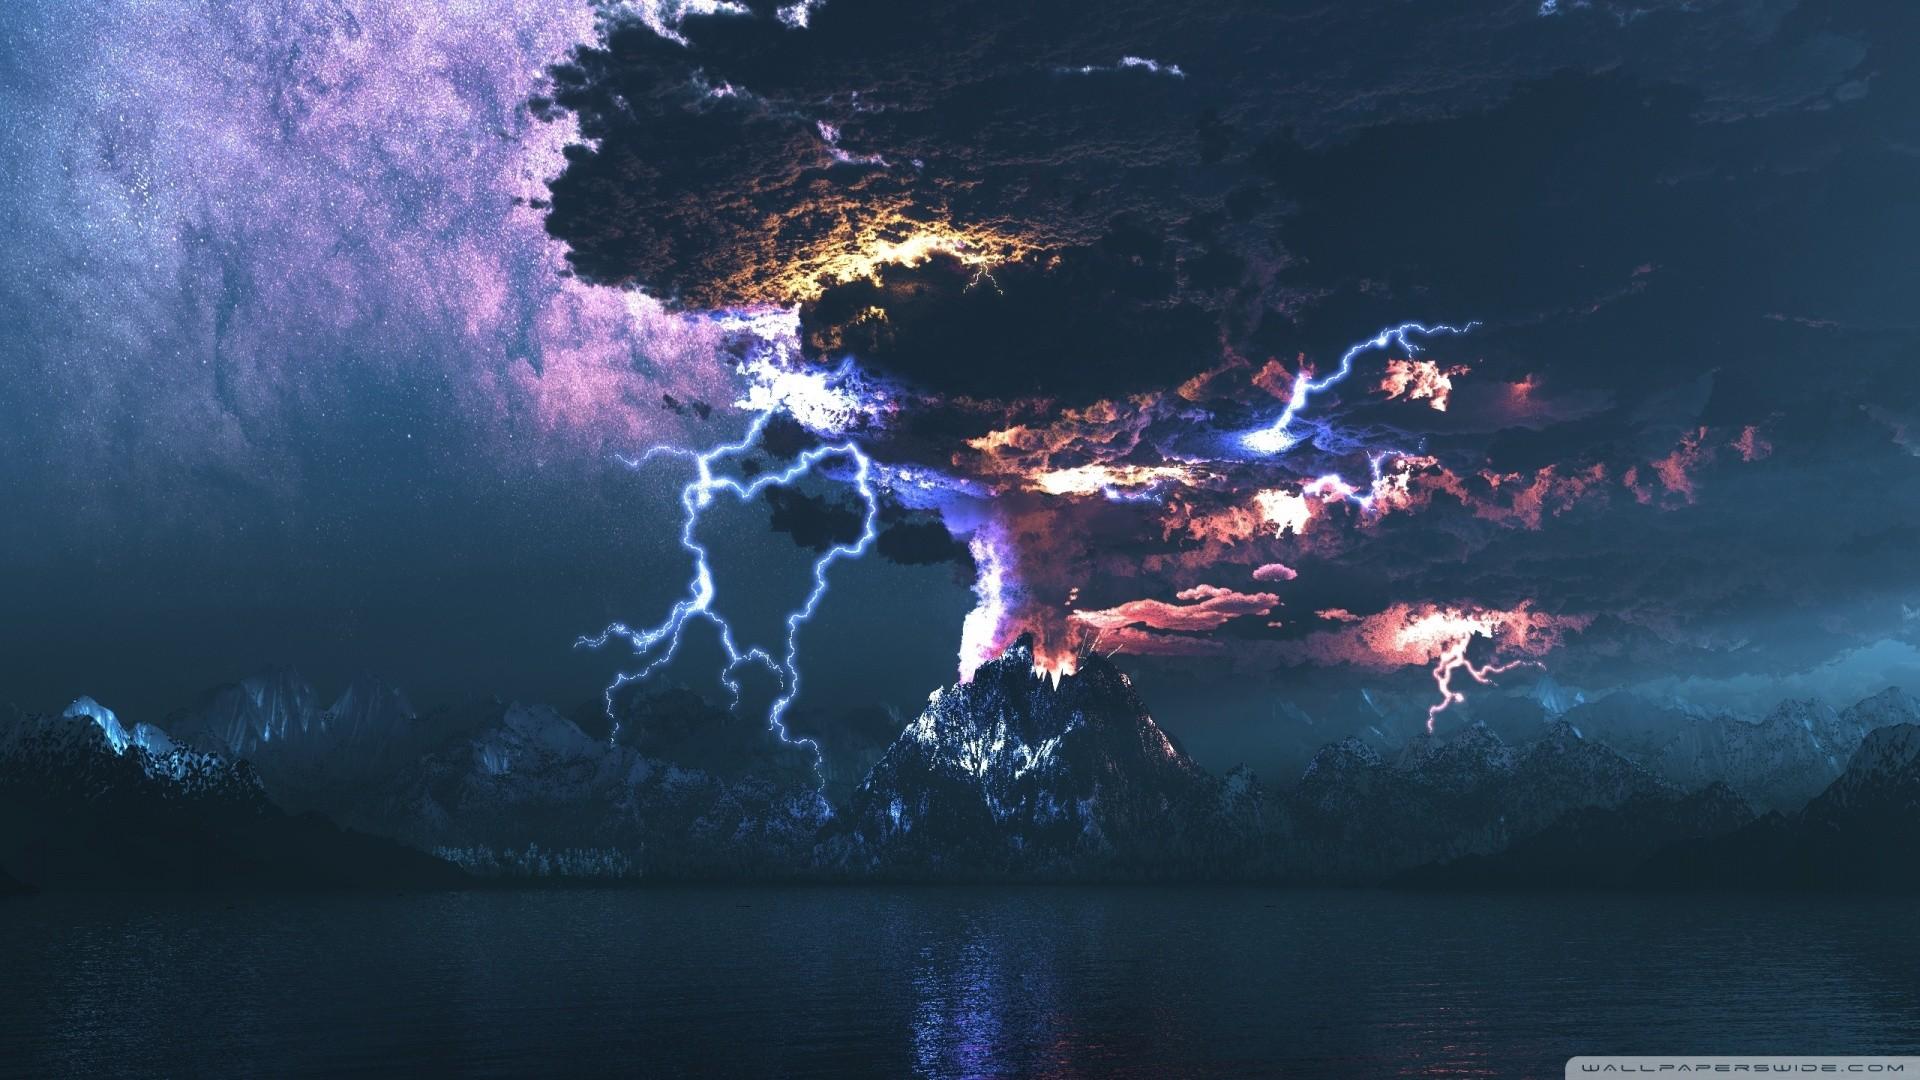 wallpaper   Nature Hd Wallpapers Lighting Nature Resolution : 1920×1440  pixelgreat …   storms/lightening   Pinterest   Hd wallpaper and Storms